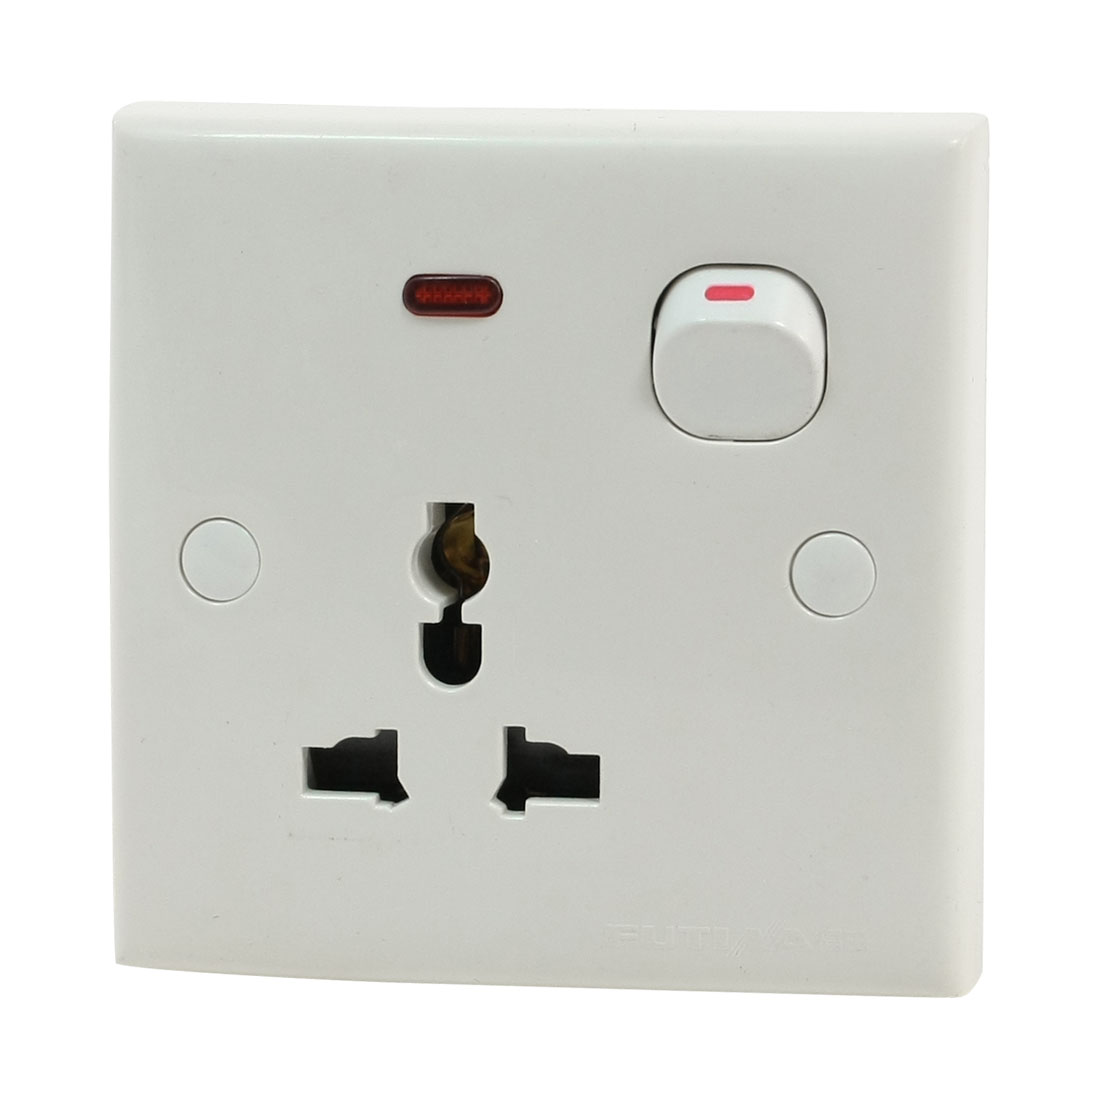 House-AC-250V-13A-3-Pin-AU-EU-UK-Socket-Switch-Wall-Plate-Power-Connector